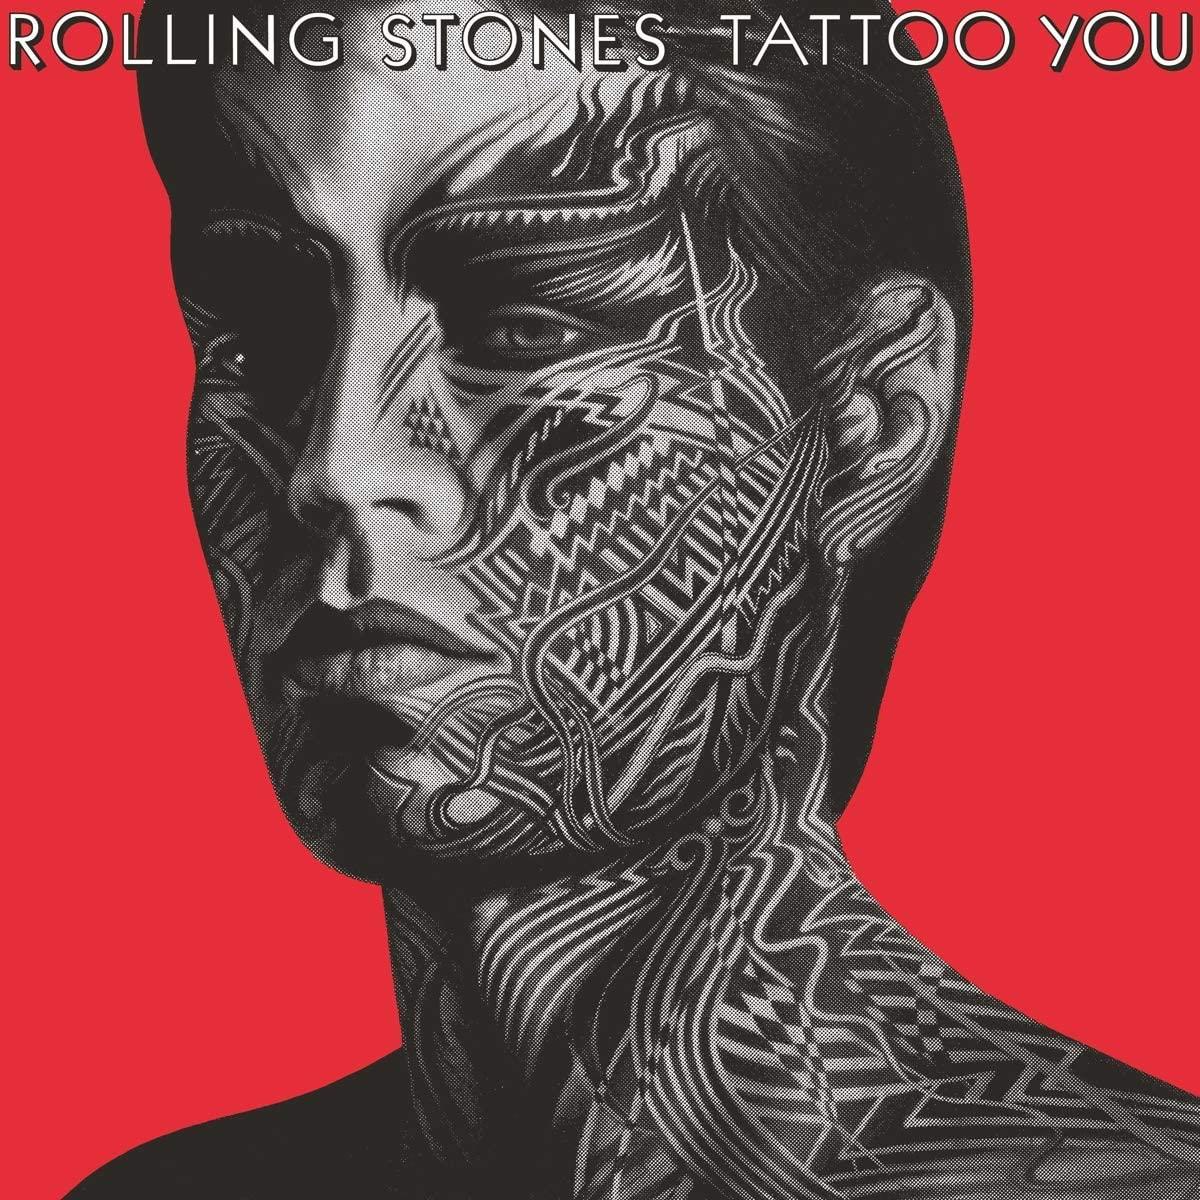 Copertina Vinile 33 giri Tattoo You di The Rolling Stones